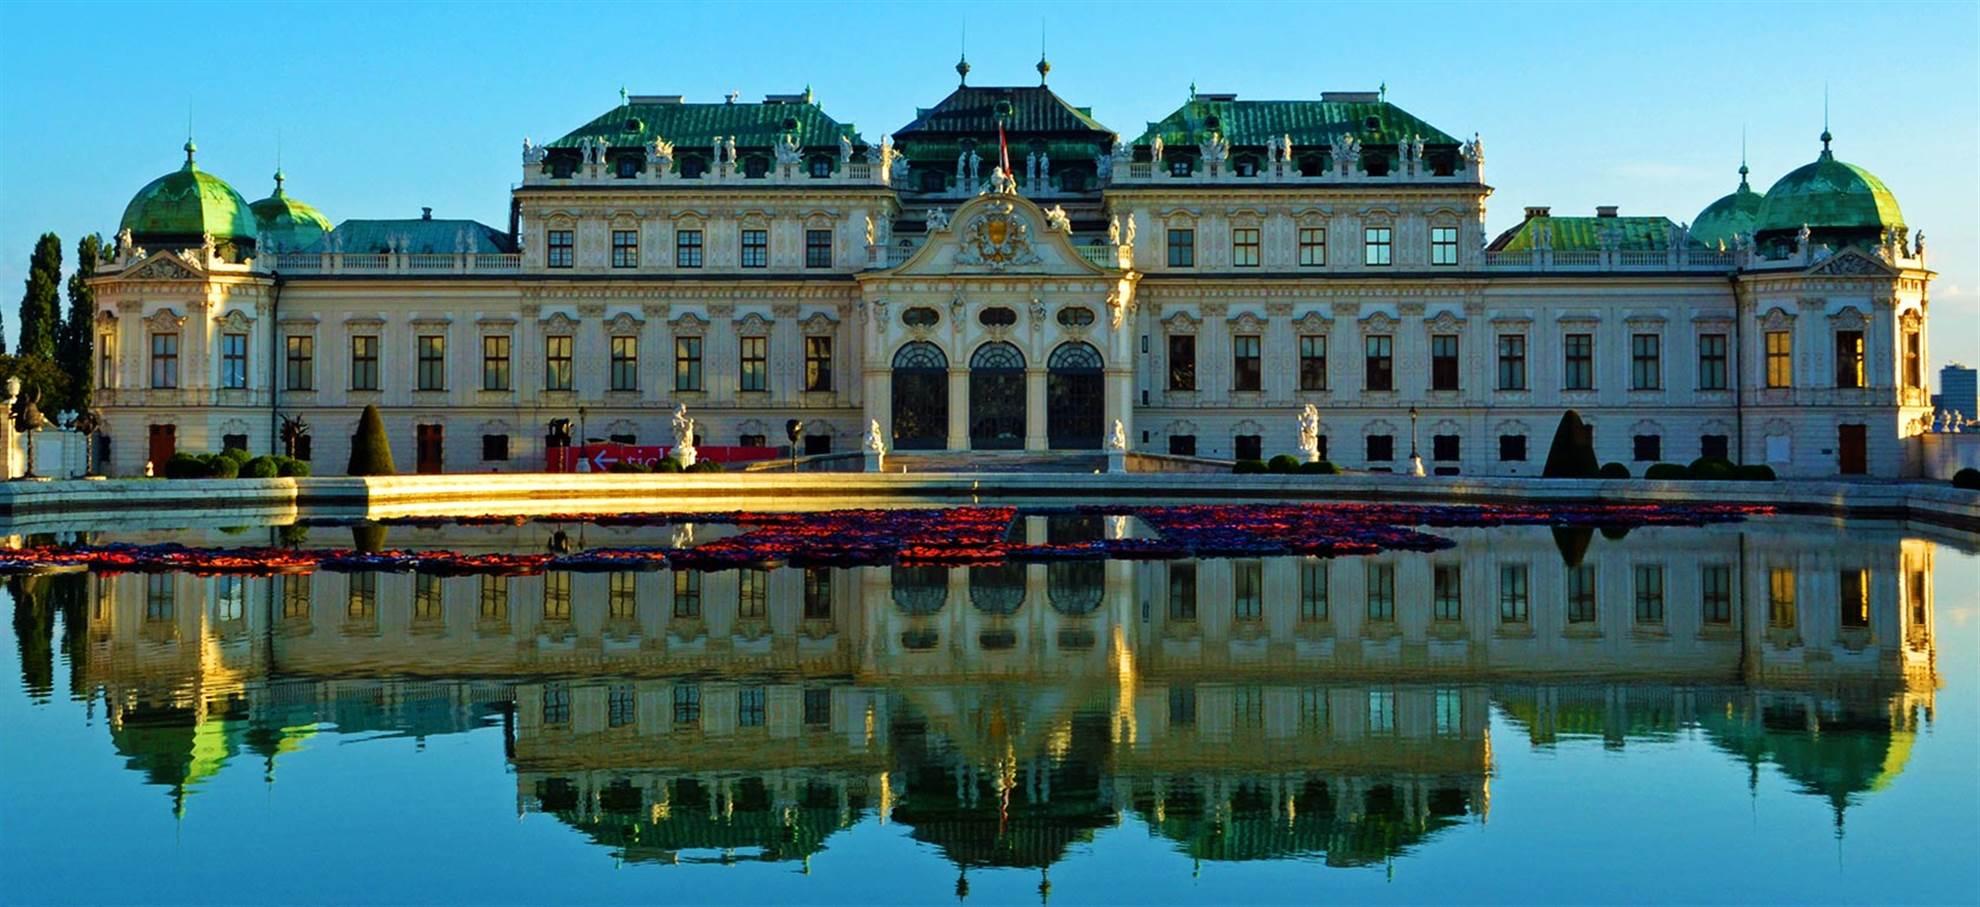 Belvedere Palast & Museum